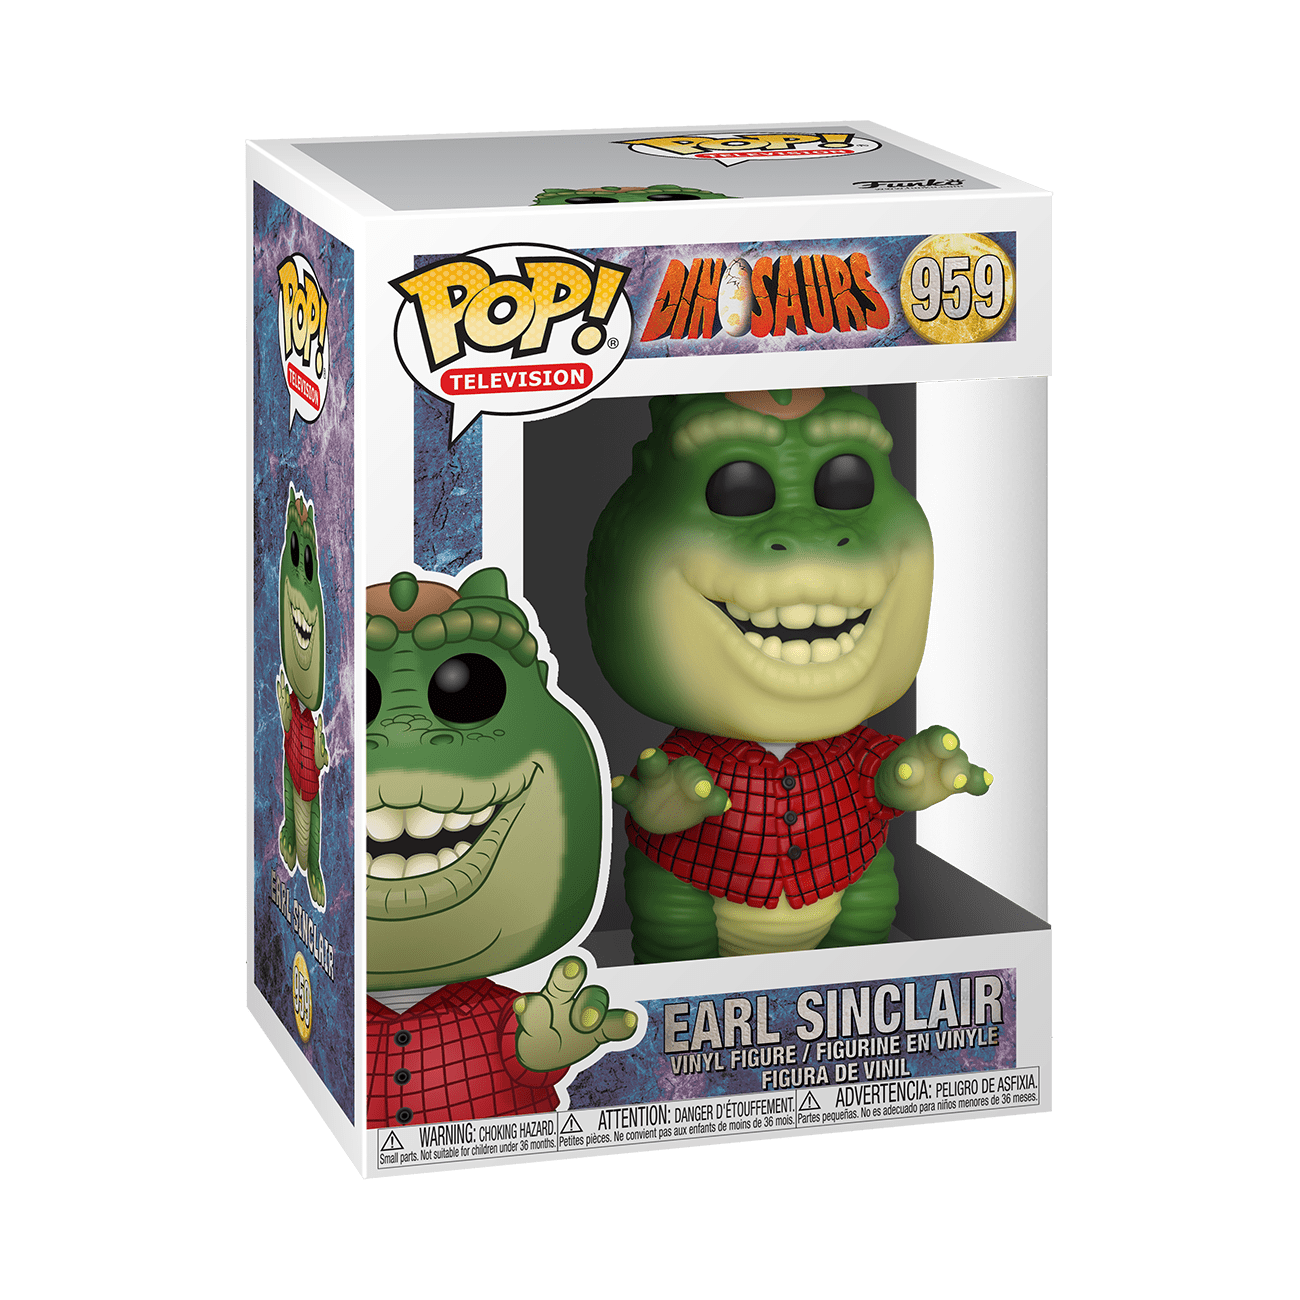 POP! TV Dinosaurs: Earl Sinclair